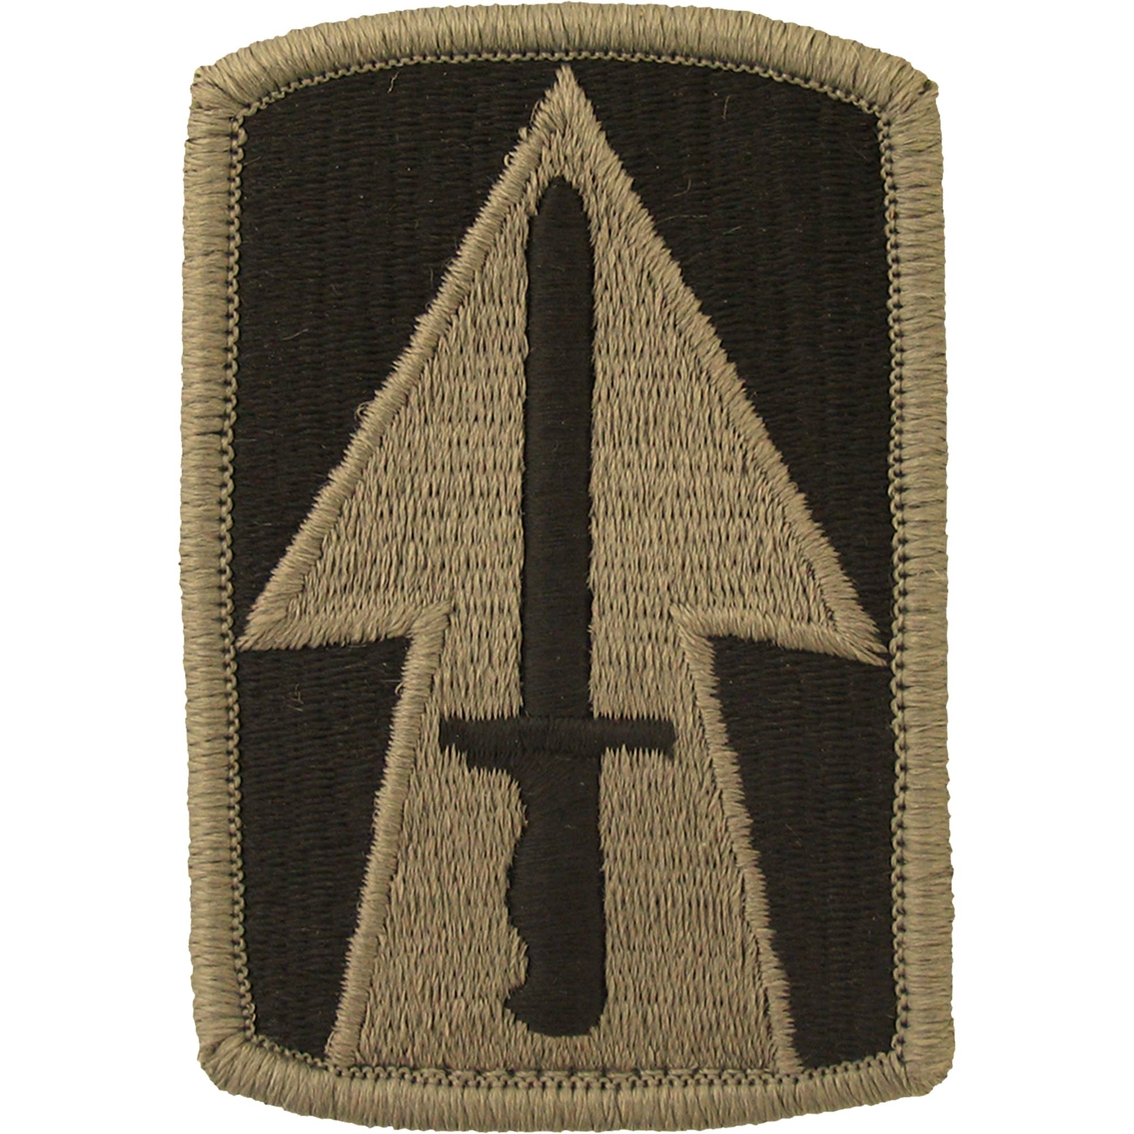 Army Unit Patch 76th Infantry Brigade Combat Team (ocp